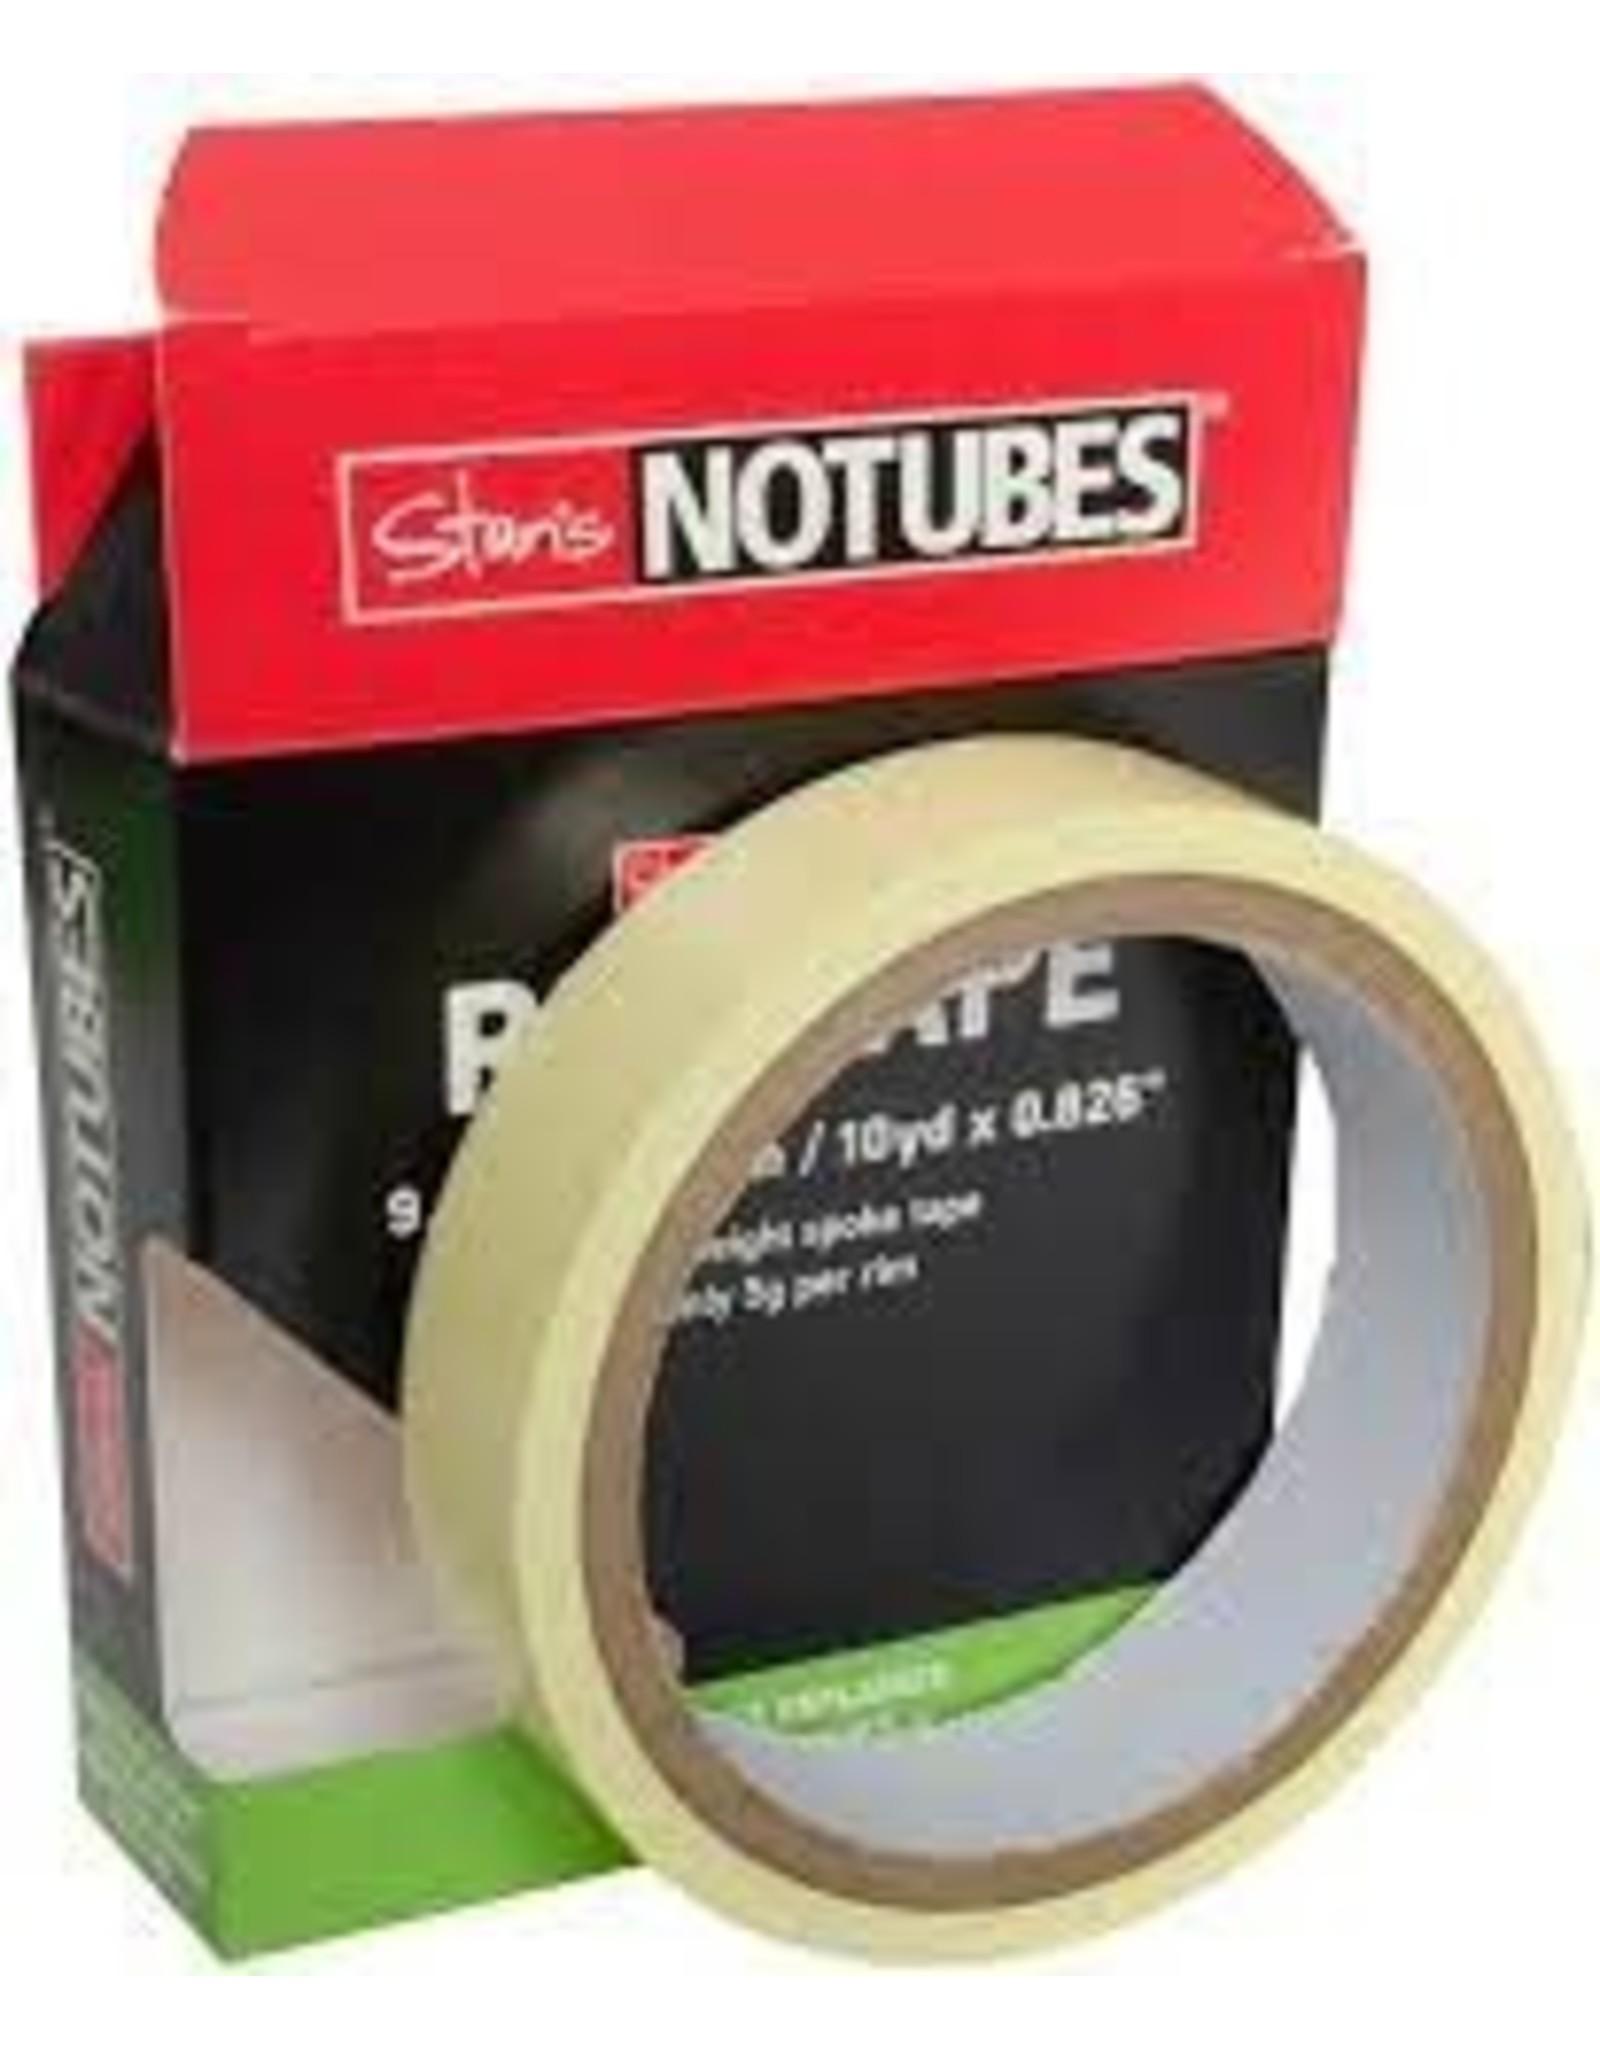 Stan's No Tubes Stan's NoTubes Rim Tape: 25mm x 10 yard roll